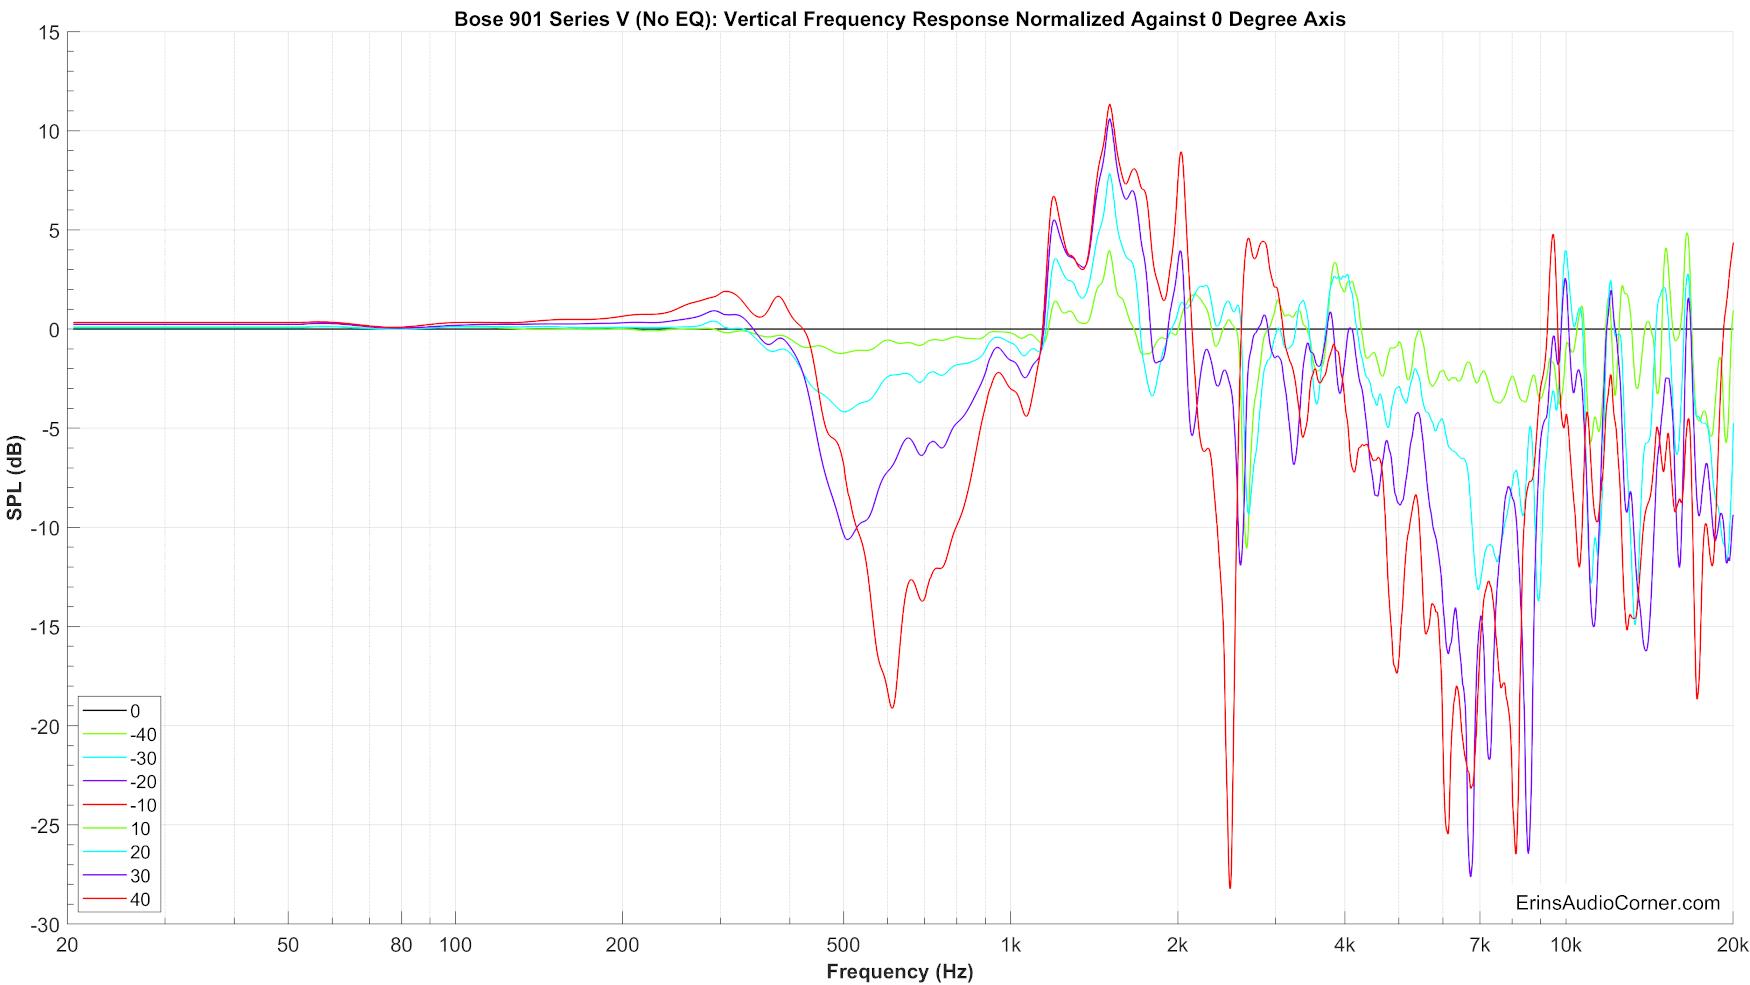 Bose%20901%20Series%20V%20(No%20EQ)%20Vertical%20FR%20Normalized.png